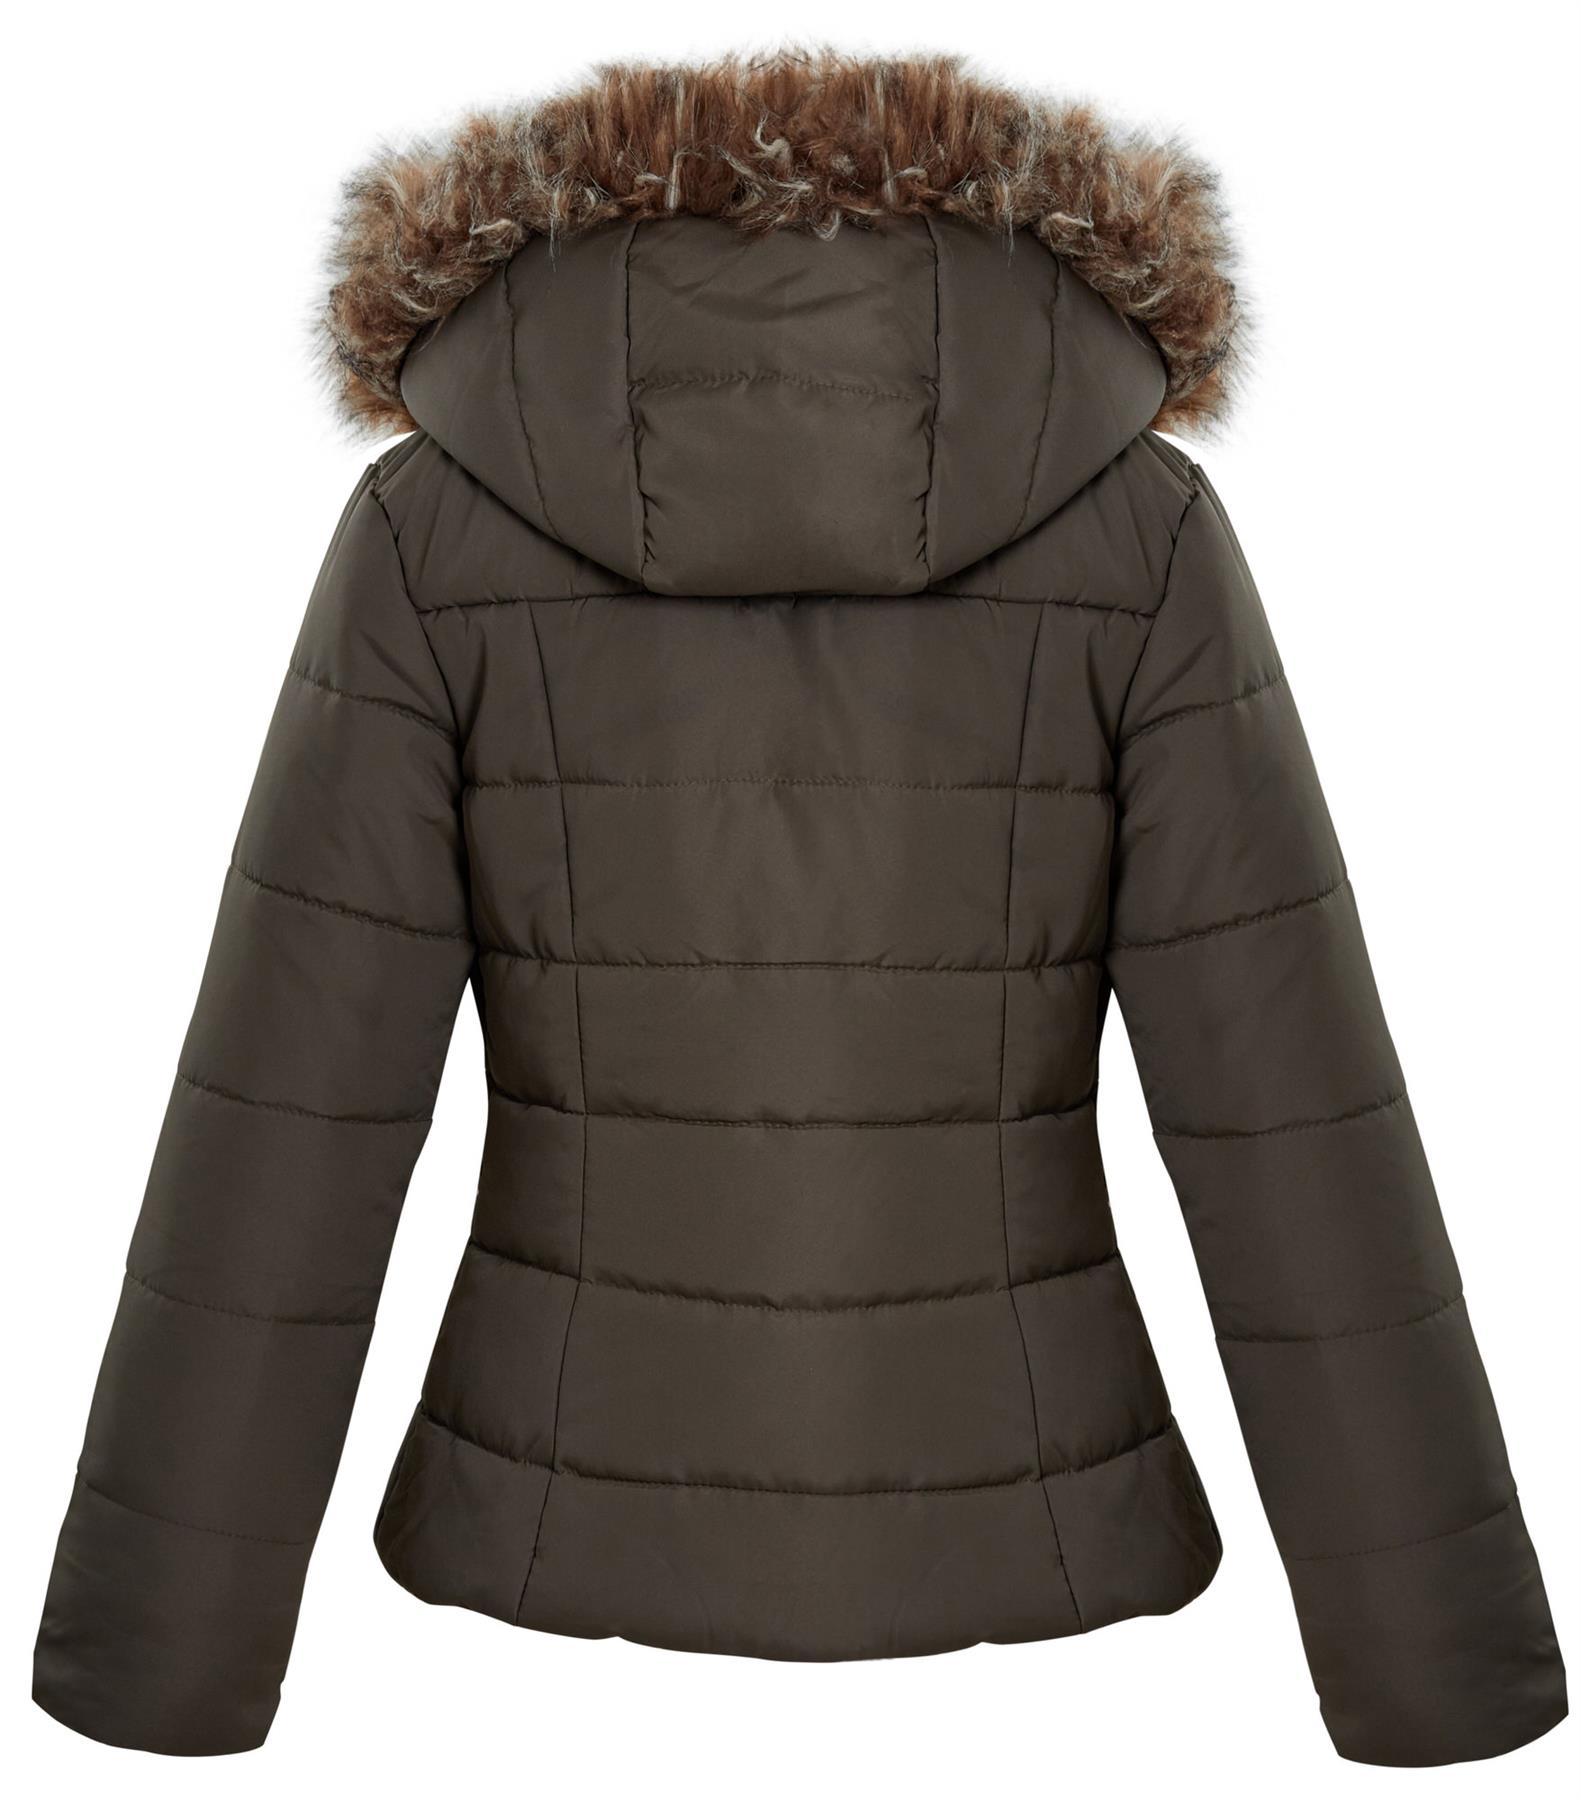 Shelikes-Ladies-Padded-Faux-Fur-Trim-Hood-Hooded-Jacket-Winter-Coat-Size-6-to-16 miniatuur 10